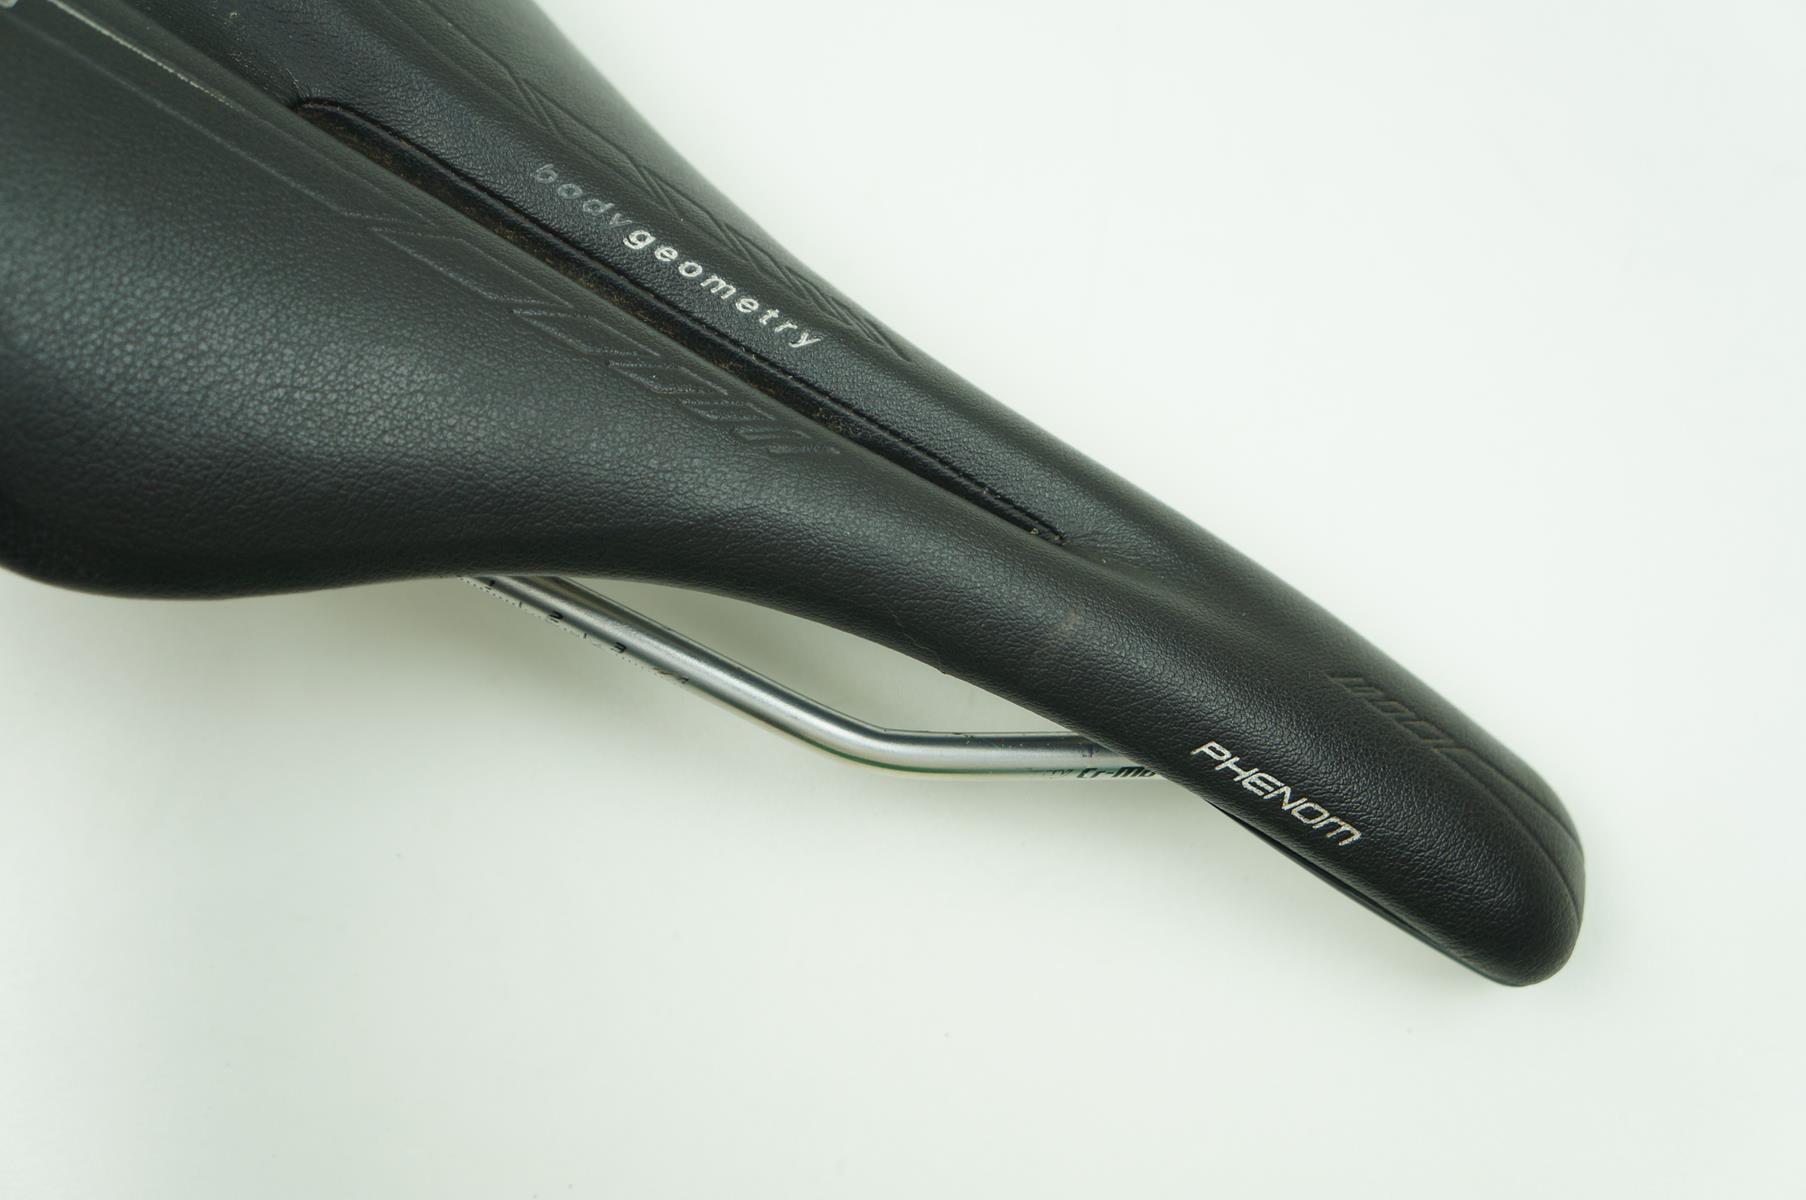 Selim Bicicleta Specialized Phenom Gel Vazado Preto 143mm - USADO